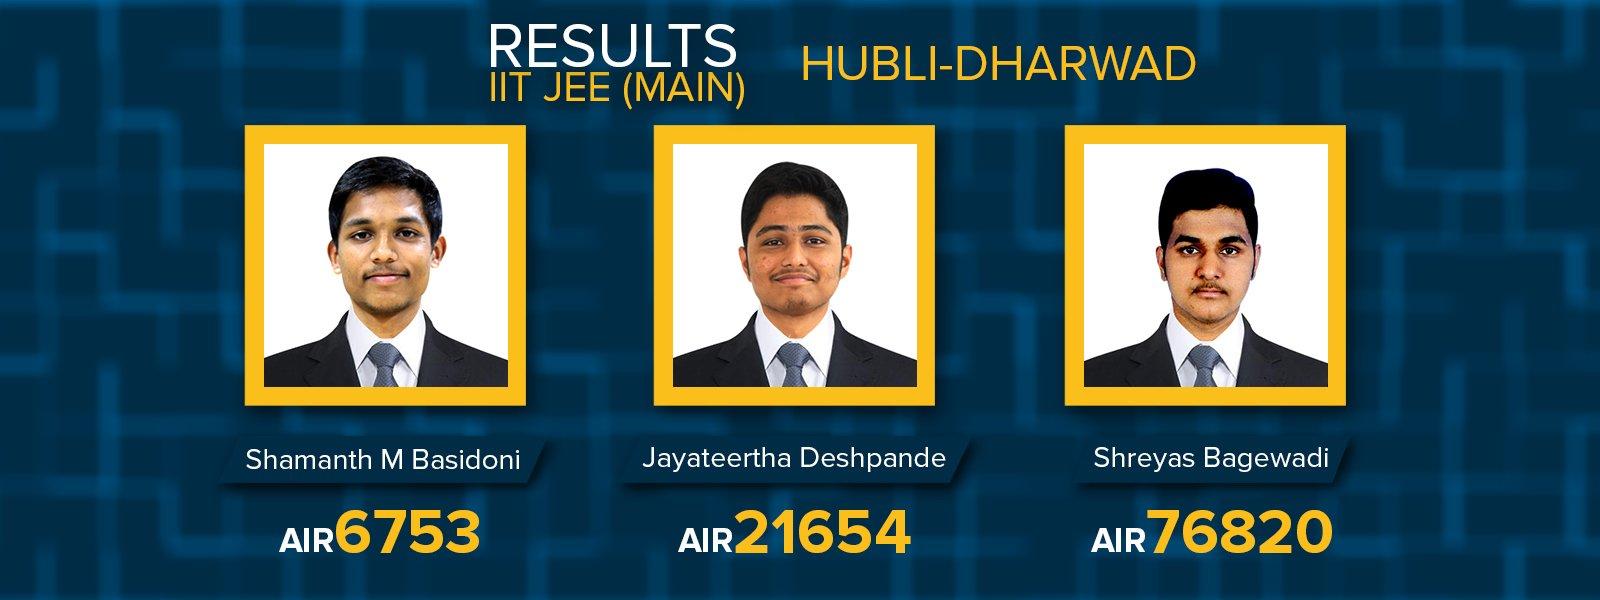 Hubli Dharwad IIT JEE MAIN 2017 results